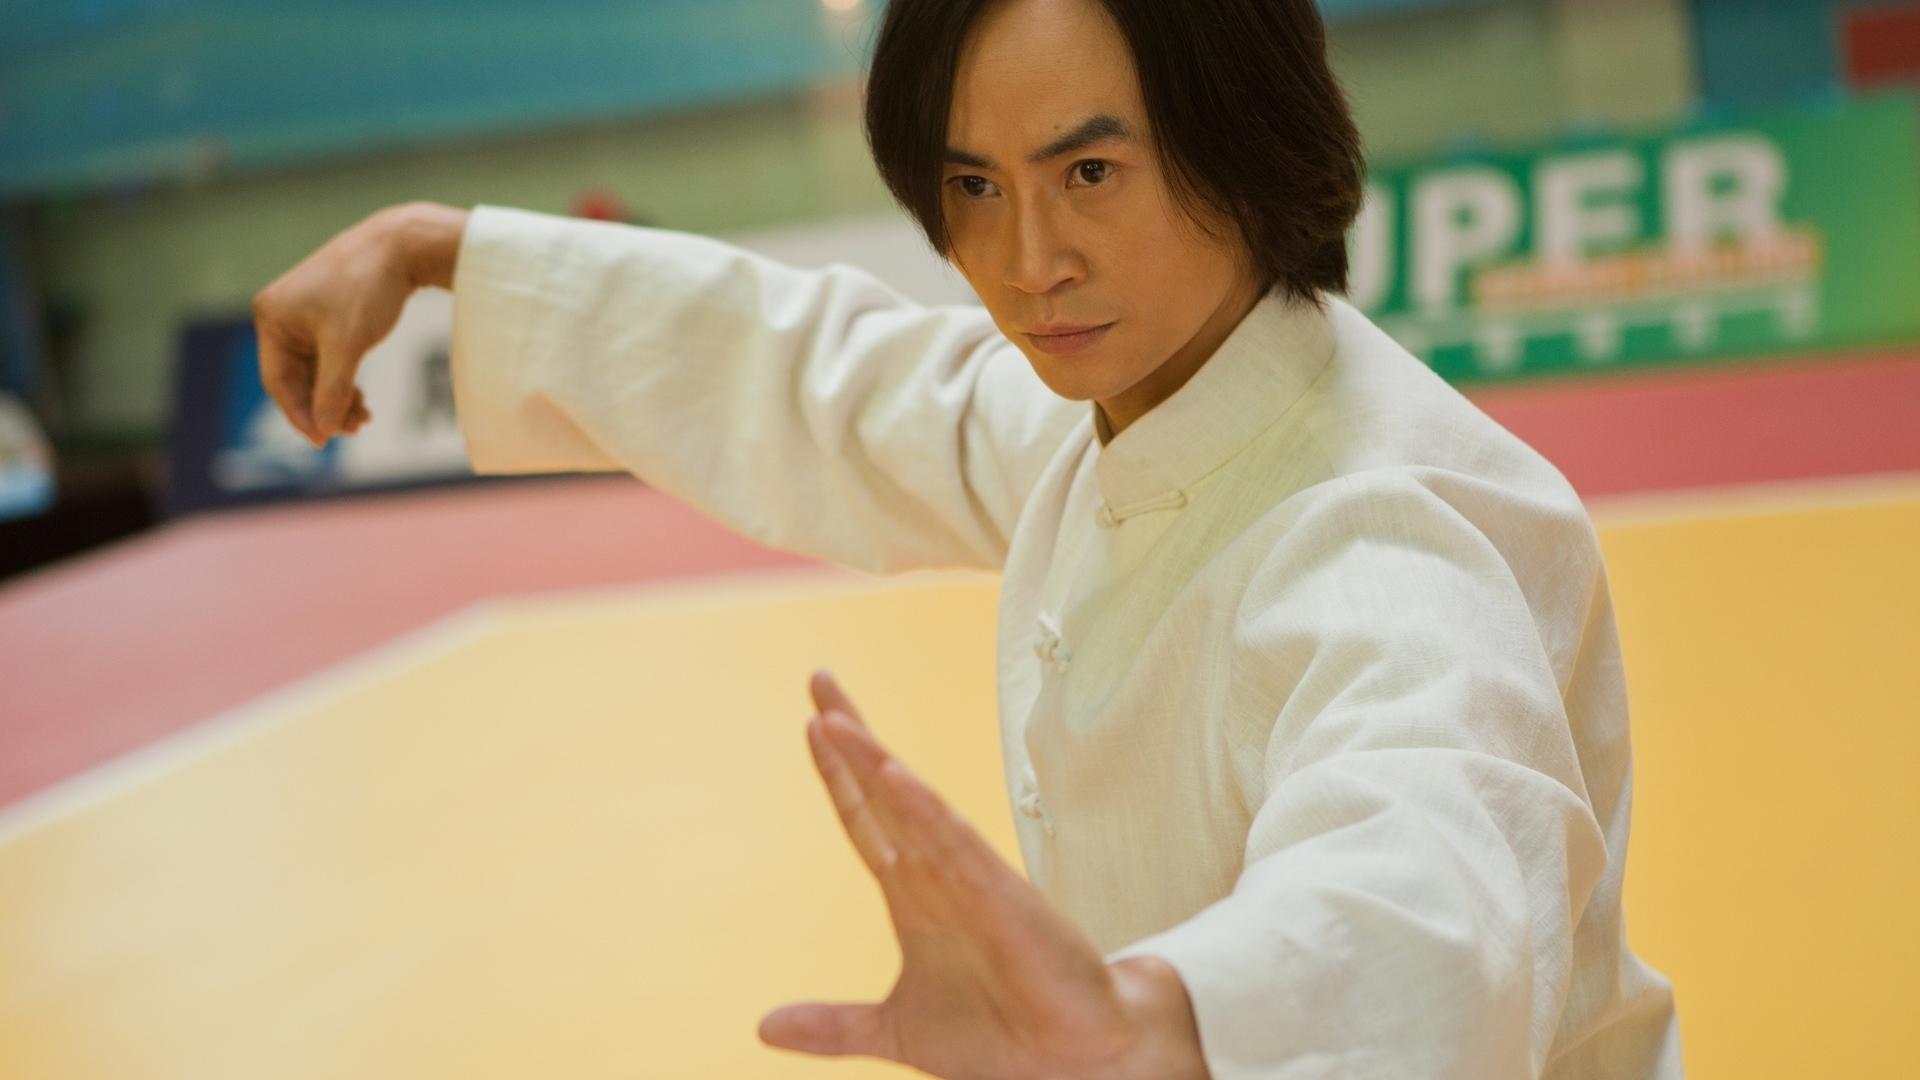 Man of Tai Chi (Film, 1h 55min, 2014) - CinéSérie